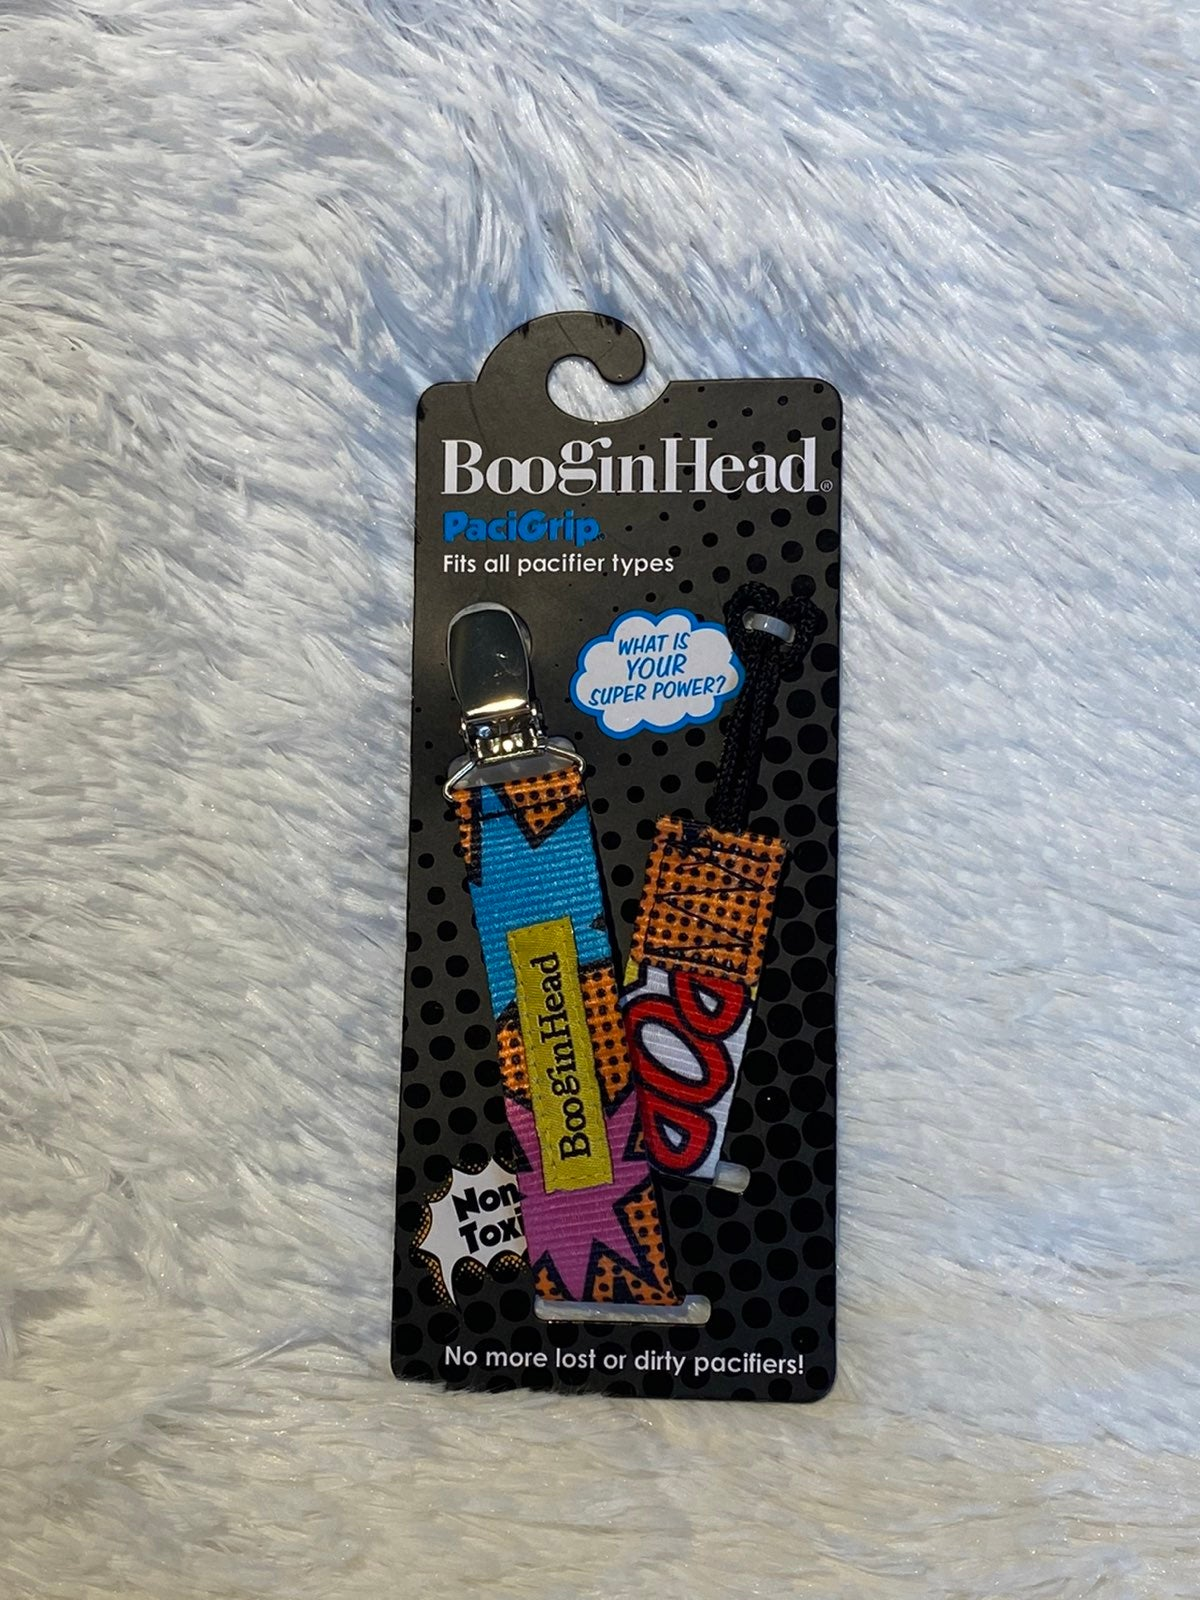 BoginHead PaciGrip